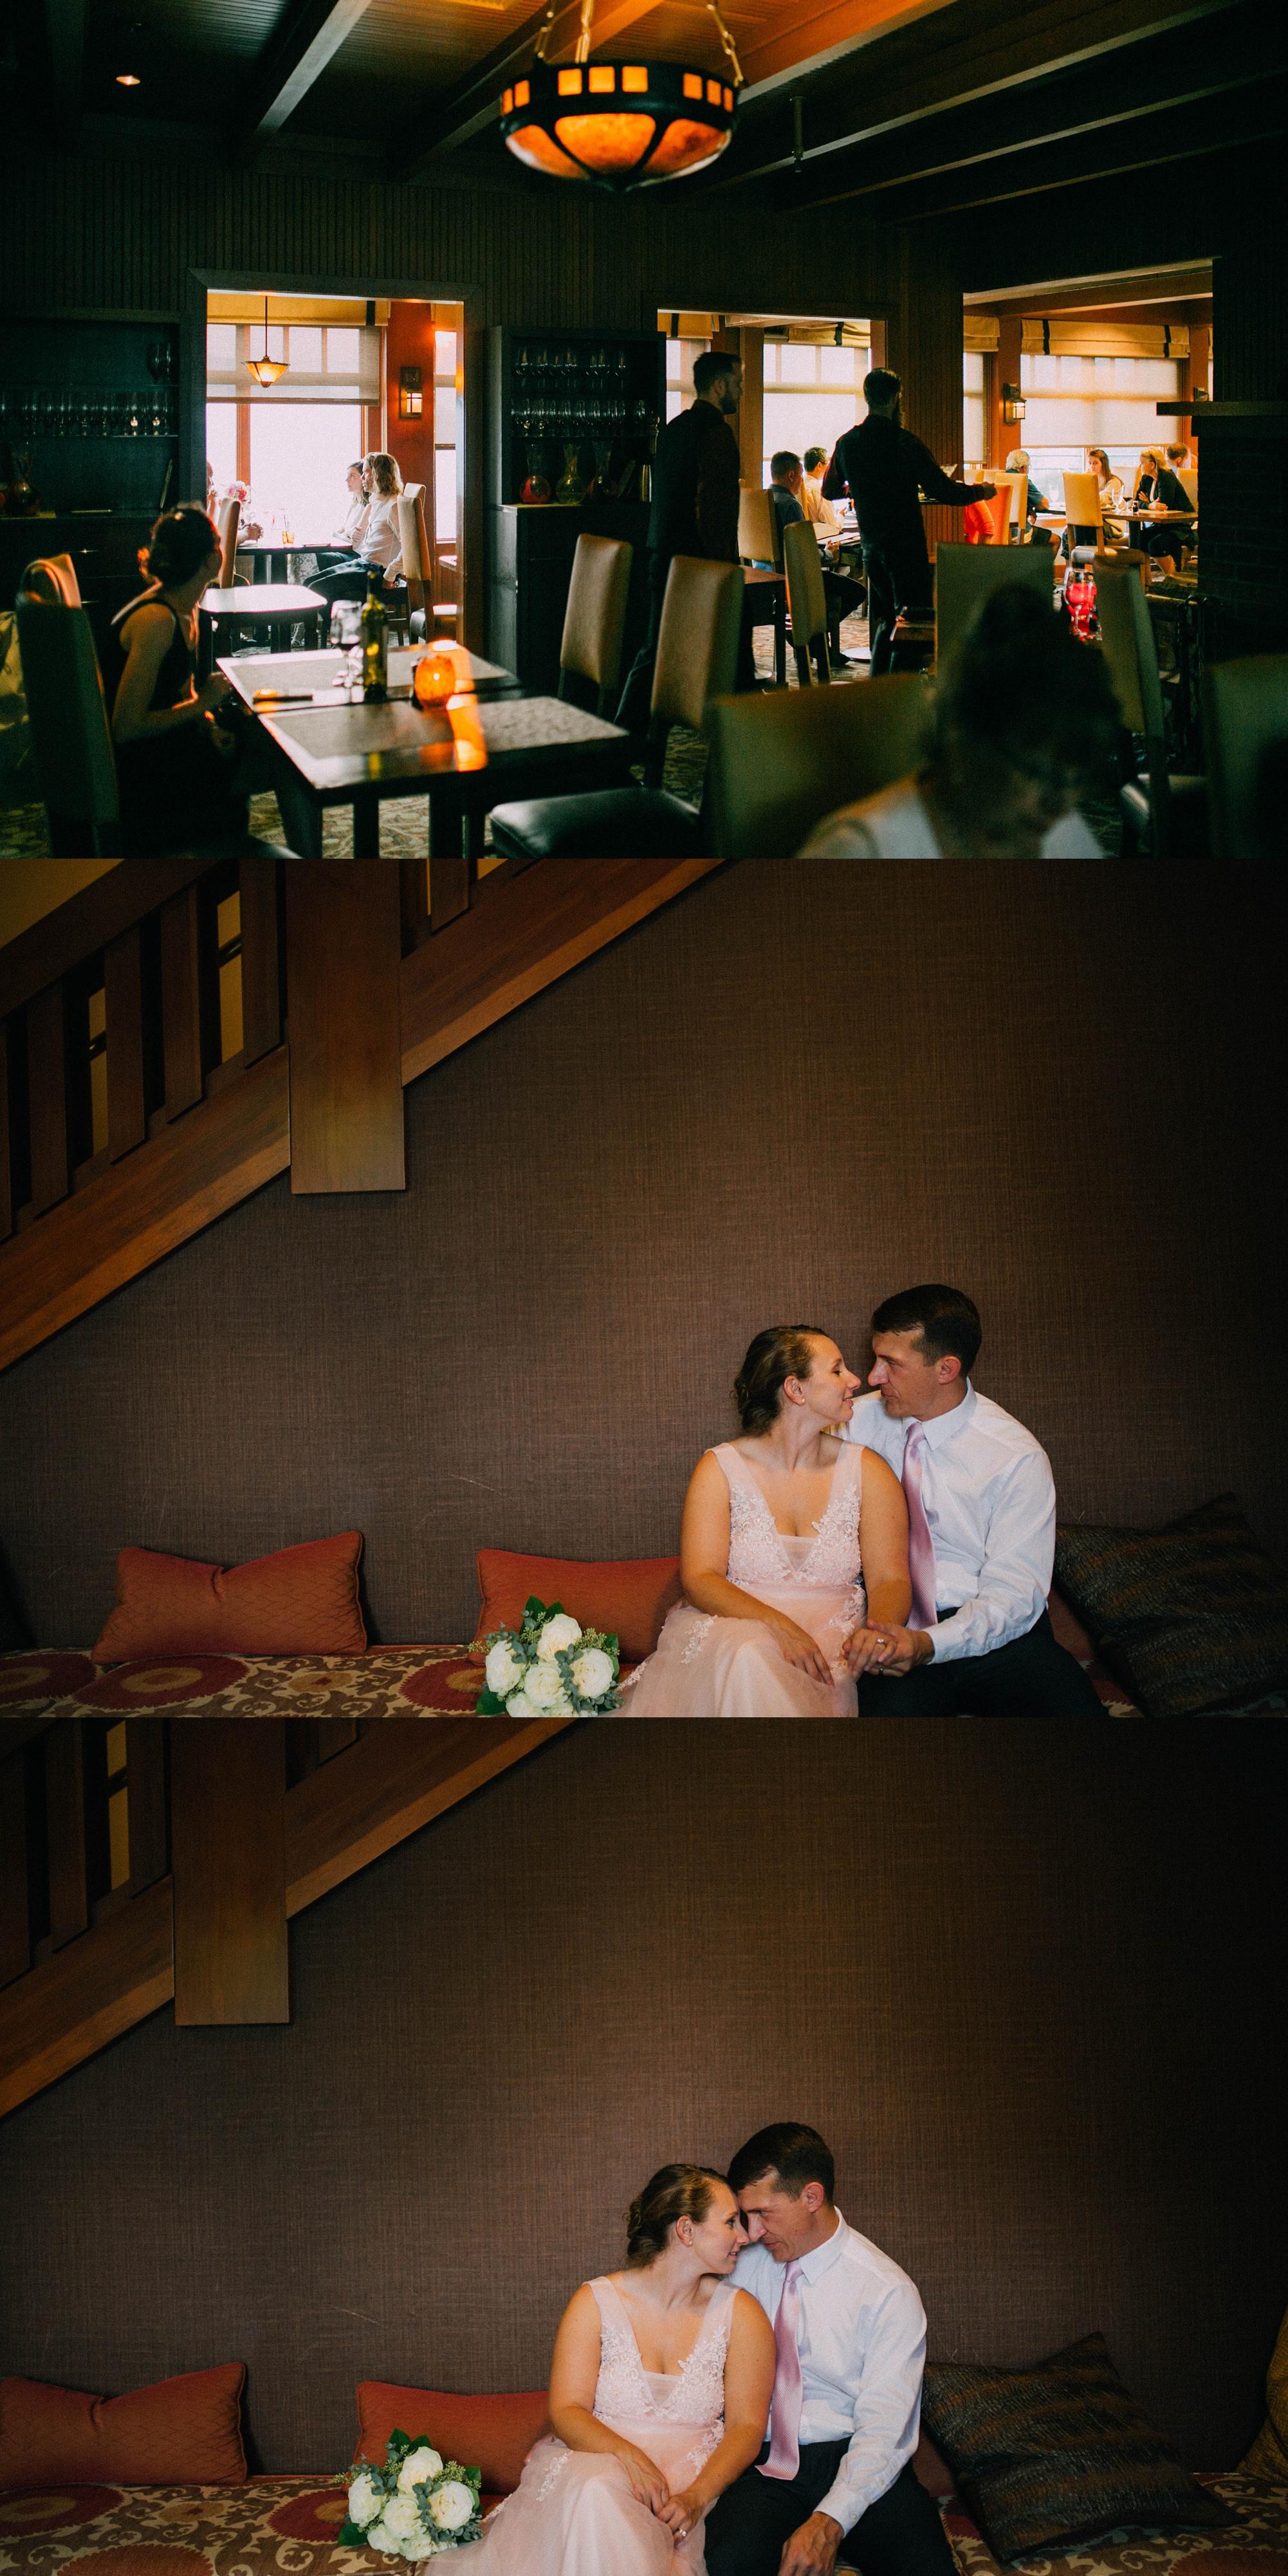 ashley_vos_seattle_ wedding_photographer_0491.jpg